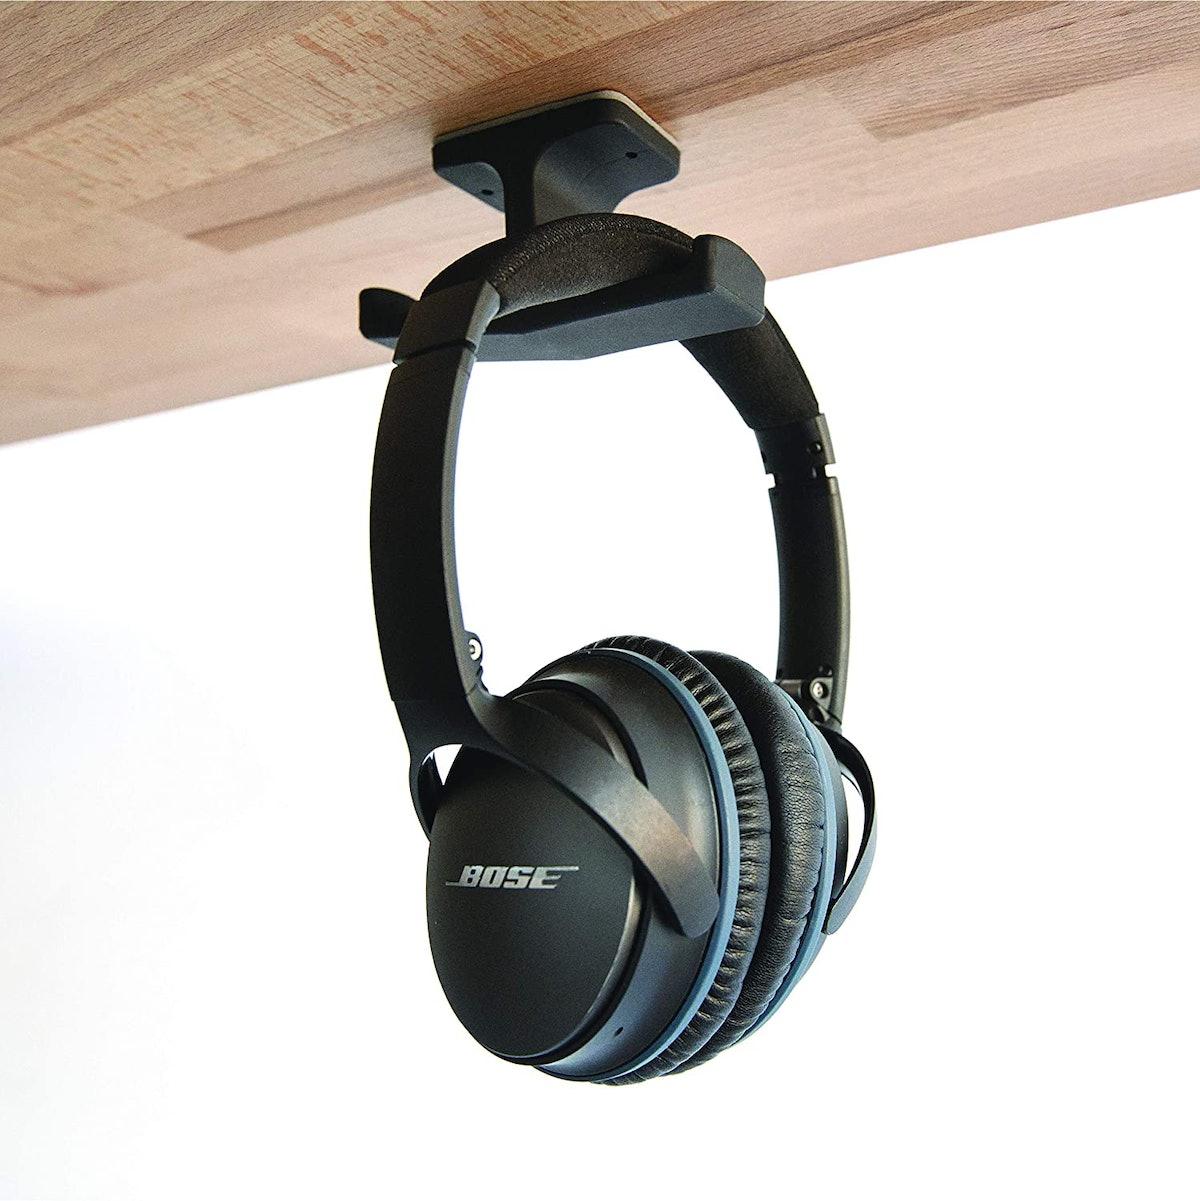 The Anchor Under-Desk Headphone Mount